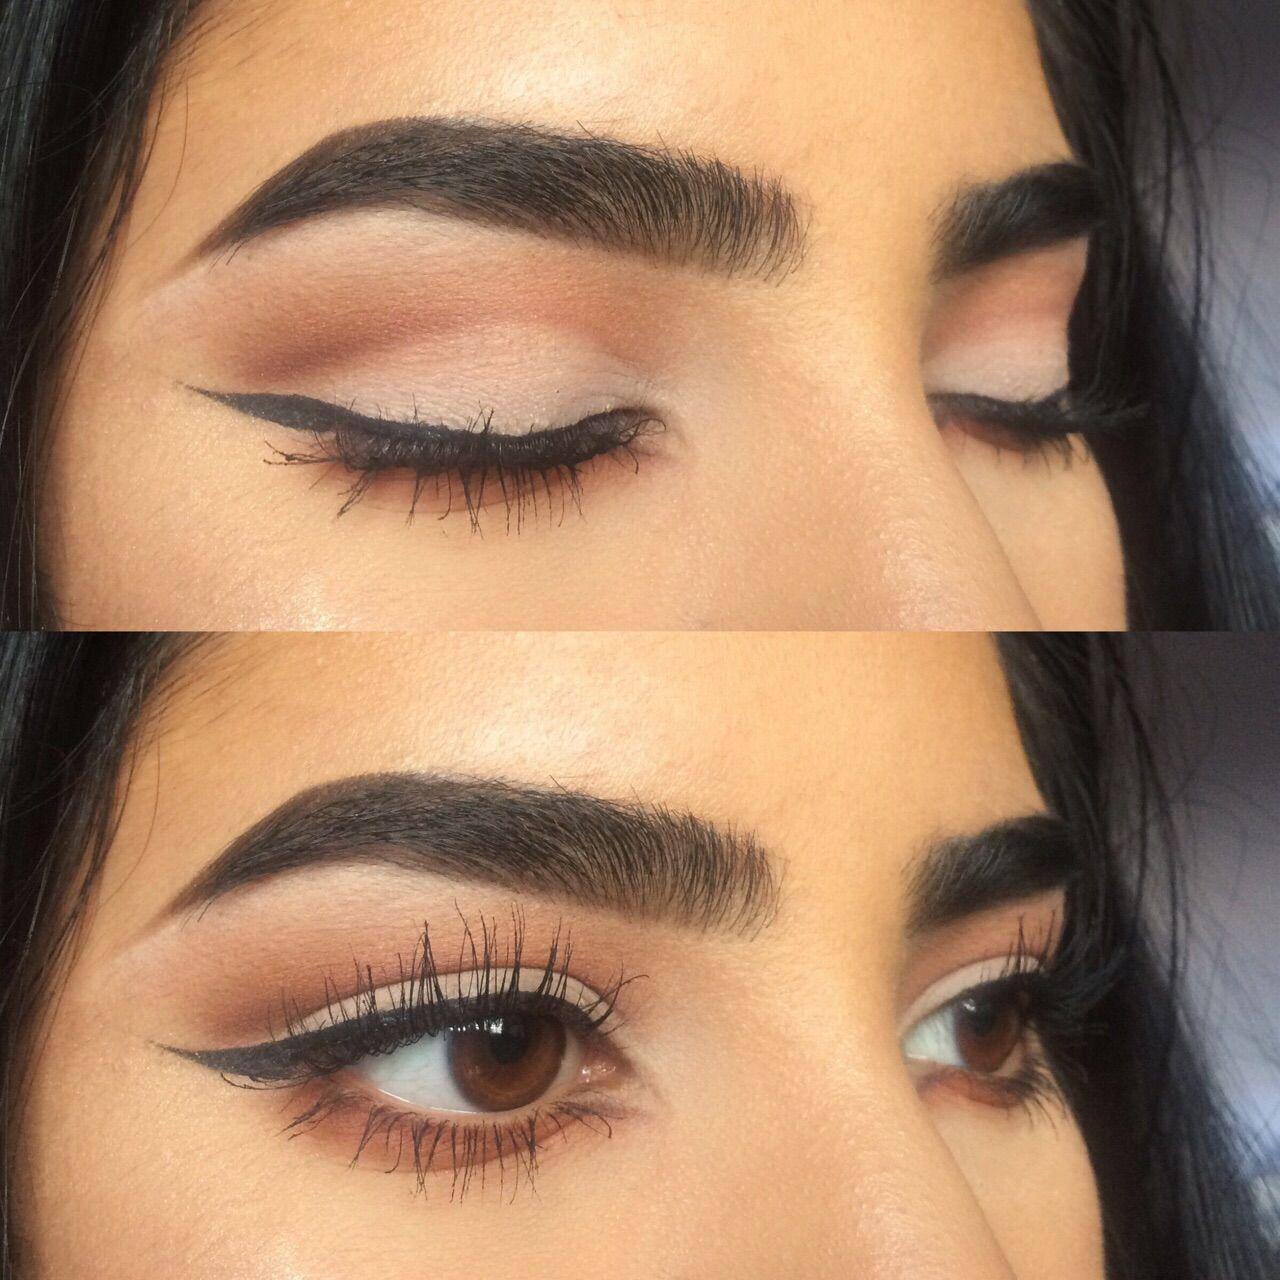 pinterest nandeezy † Skin makeup, Eye makeup